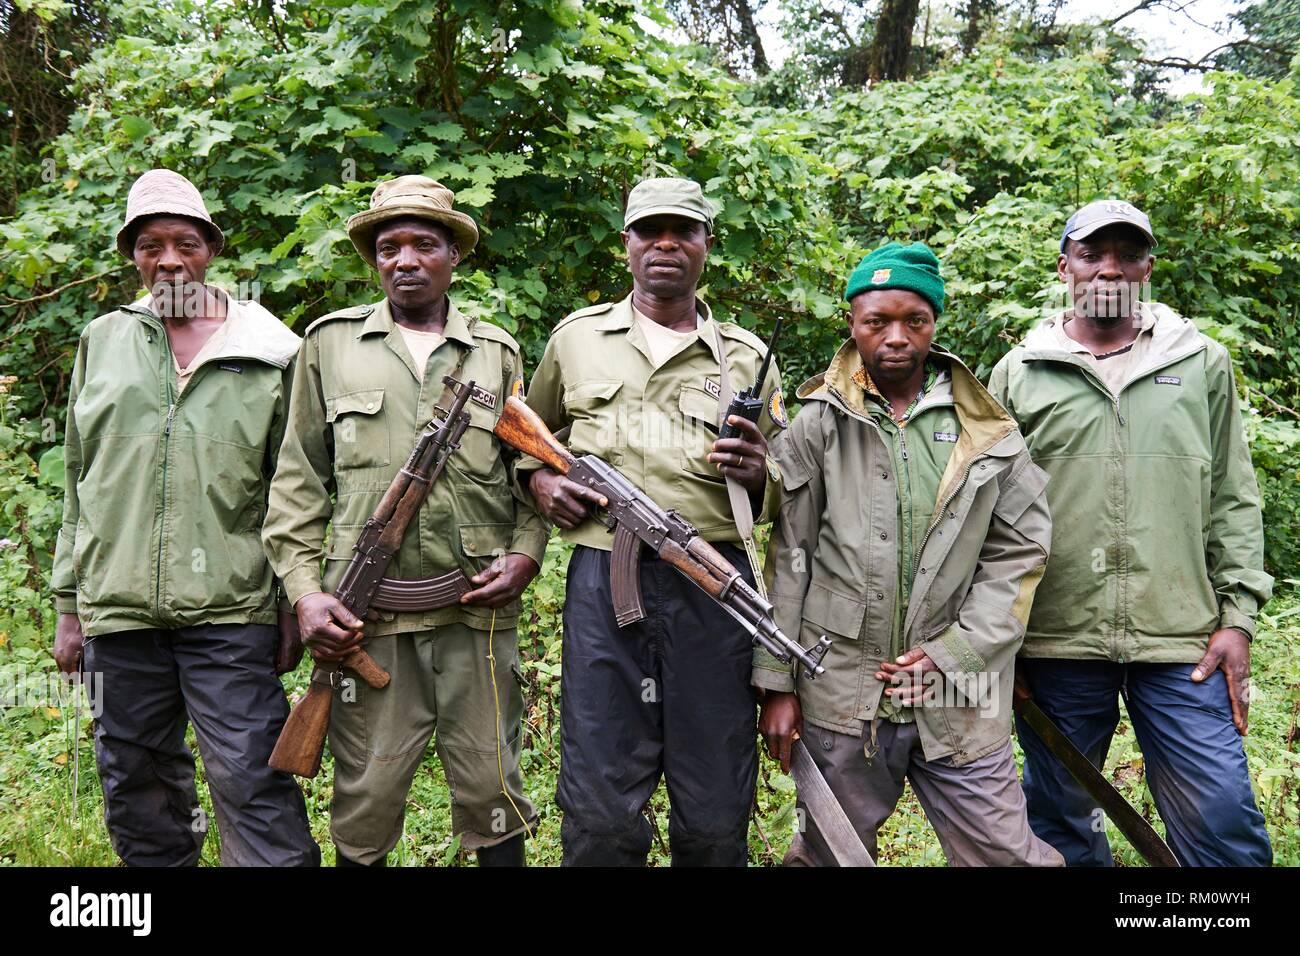 Team of guides, guards and trackers for Moutain gorilla (Gorilla beringei beringei) at the Virunga National Park, North Kivu, Democratic Republic of - Stock Image